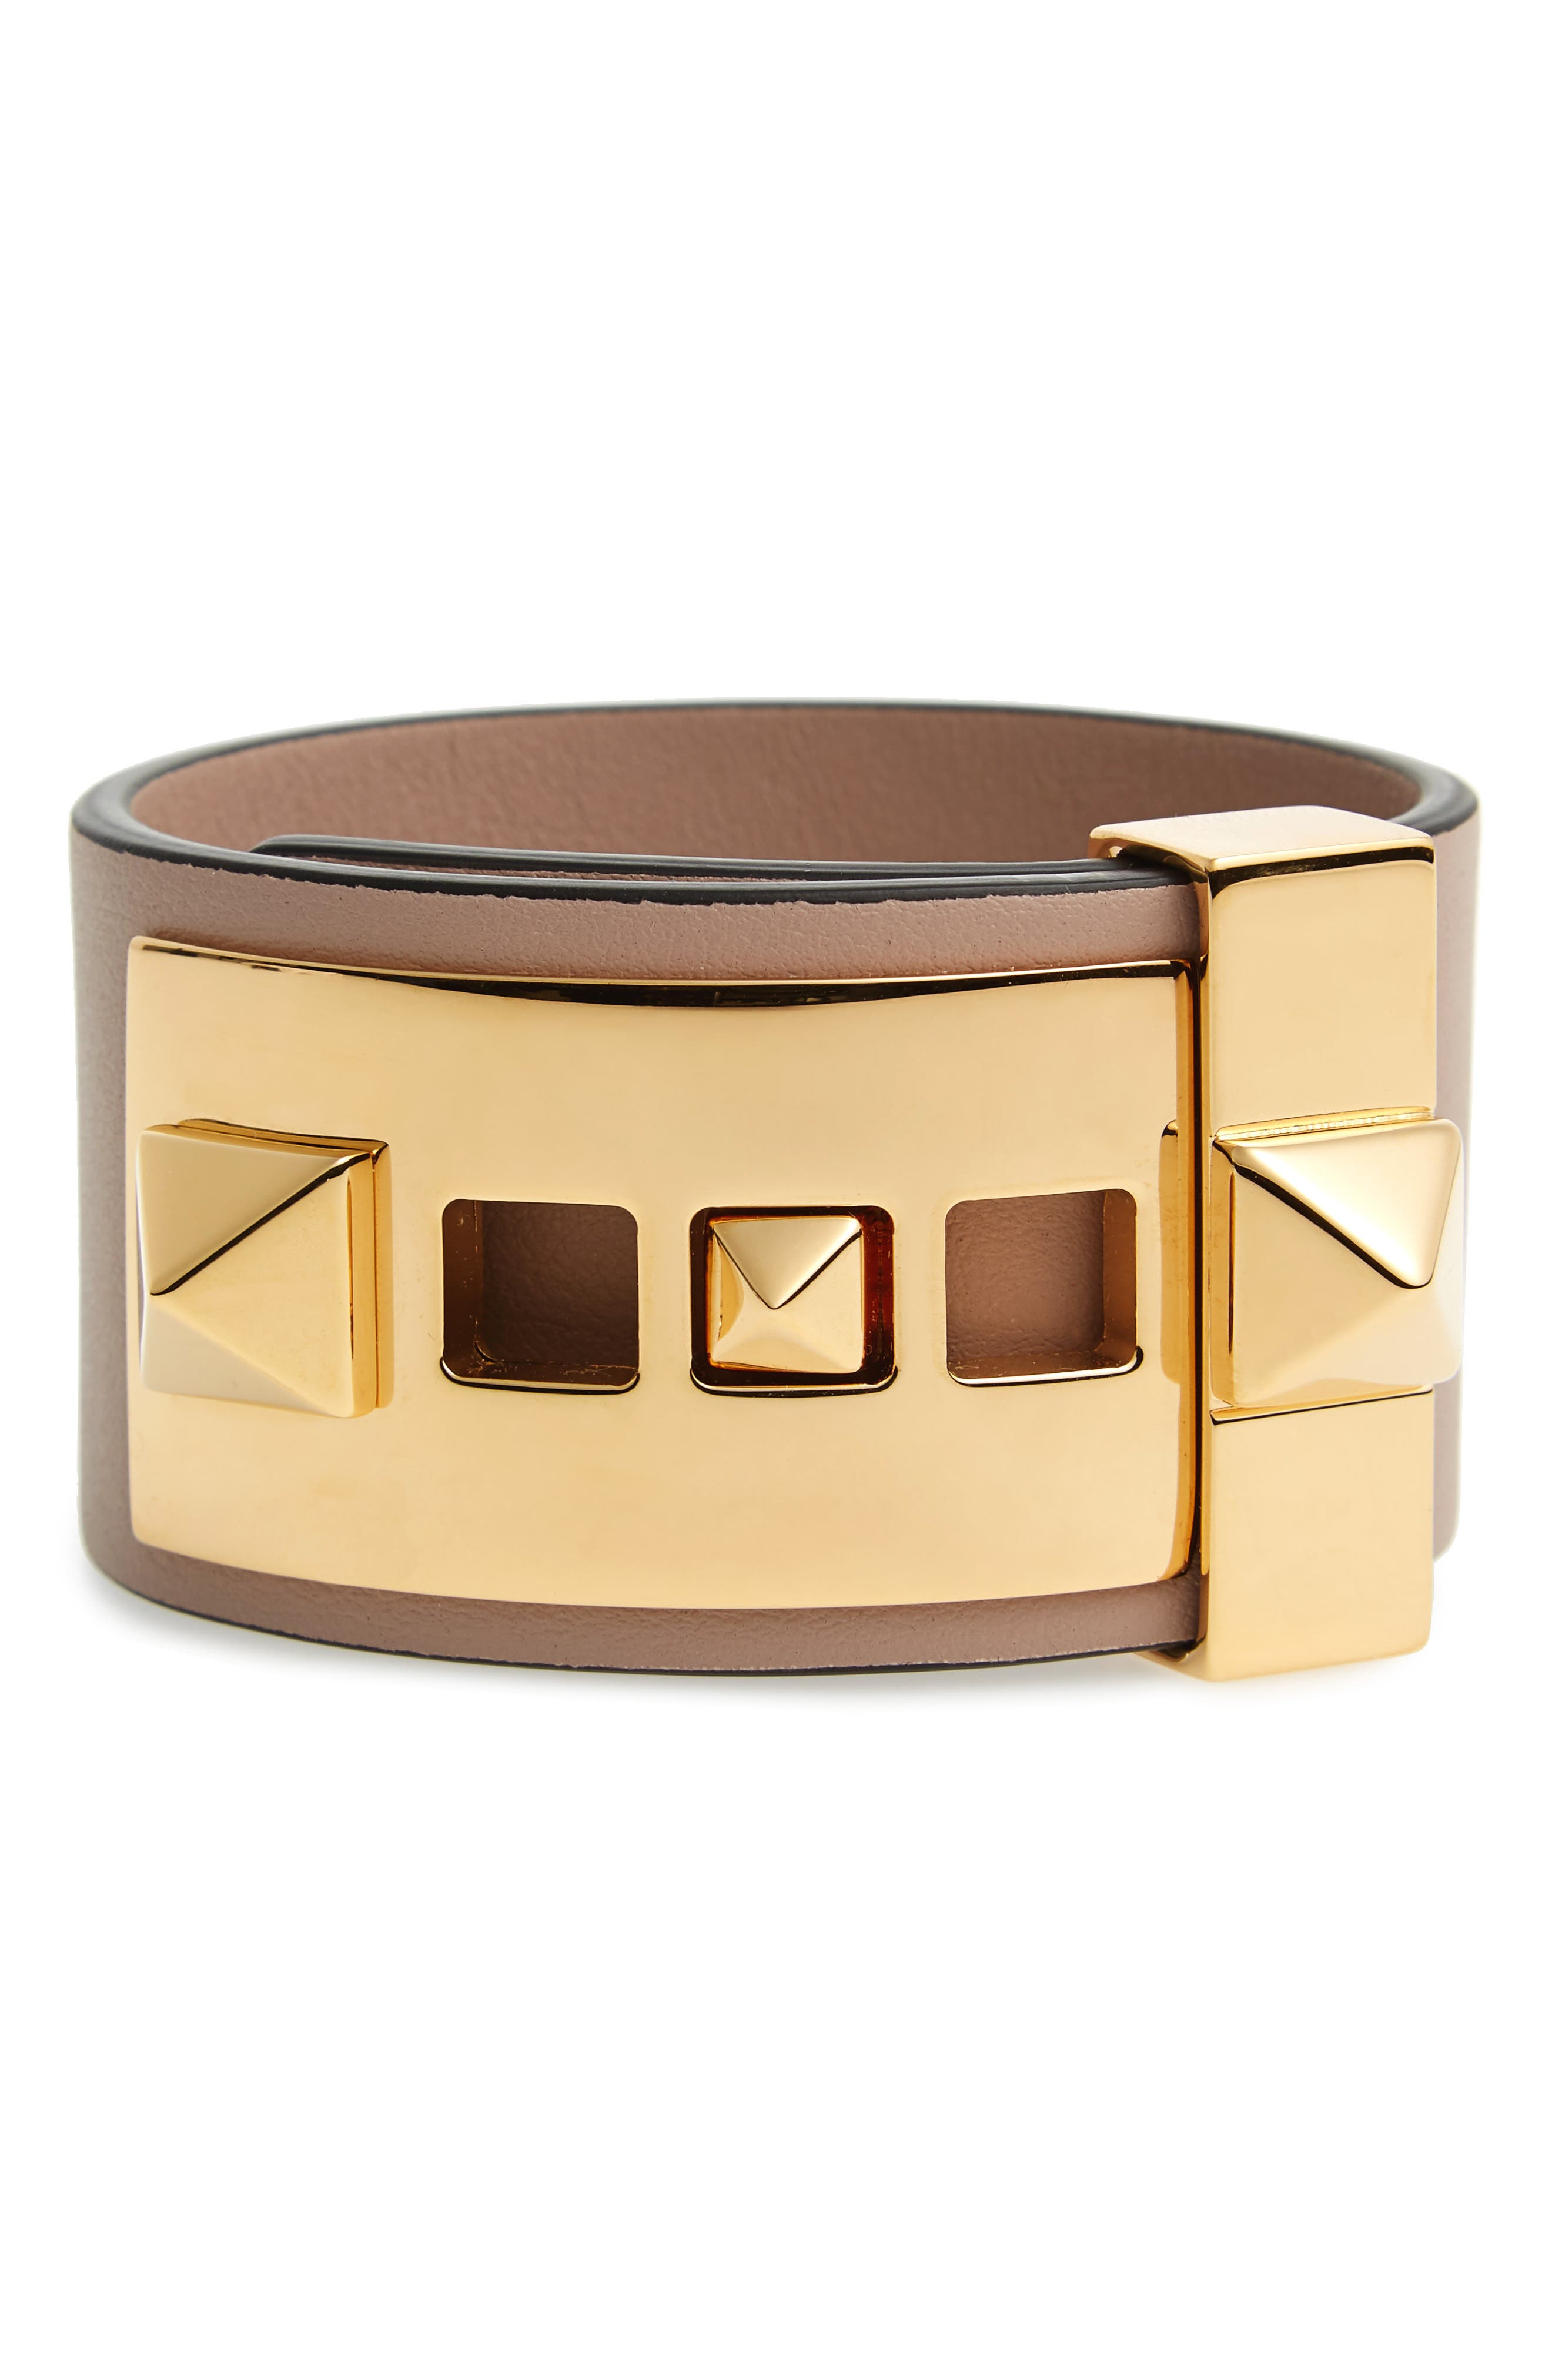 Main Image - VALENTINO GARAVANI Rockstud Calfskin Leather Bracelet